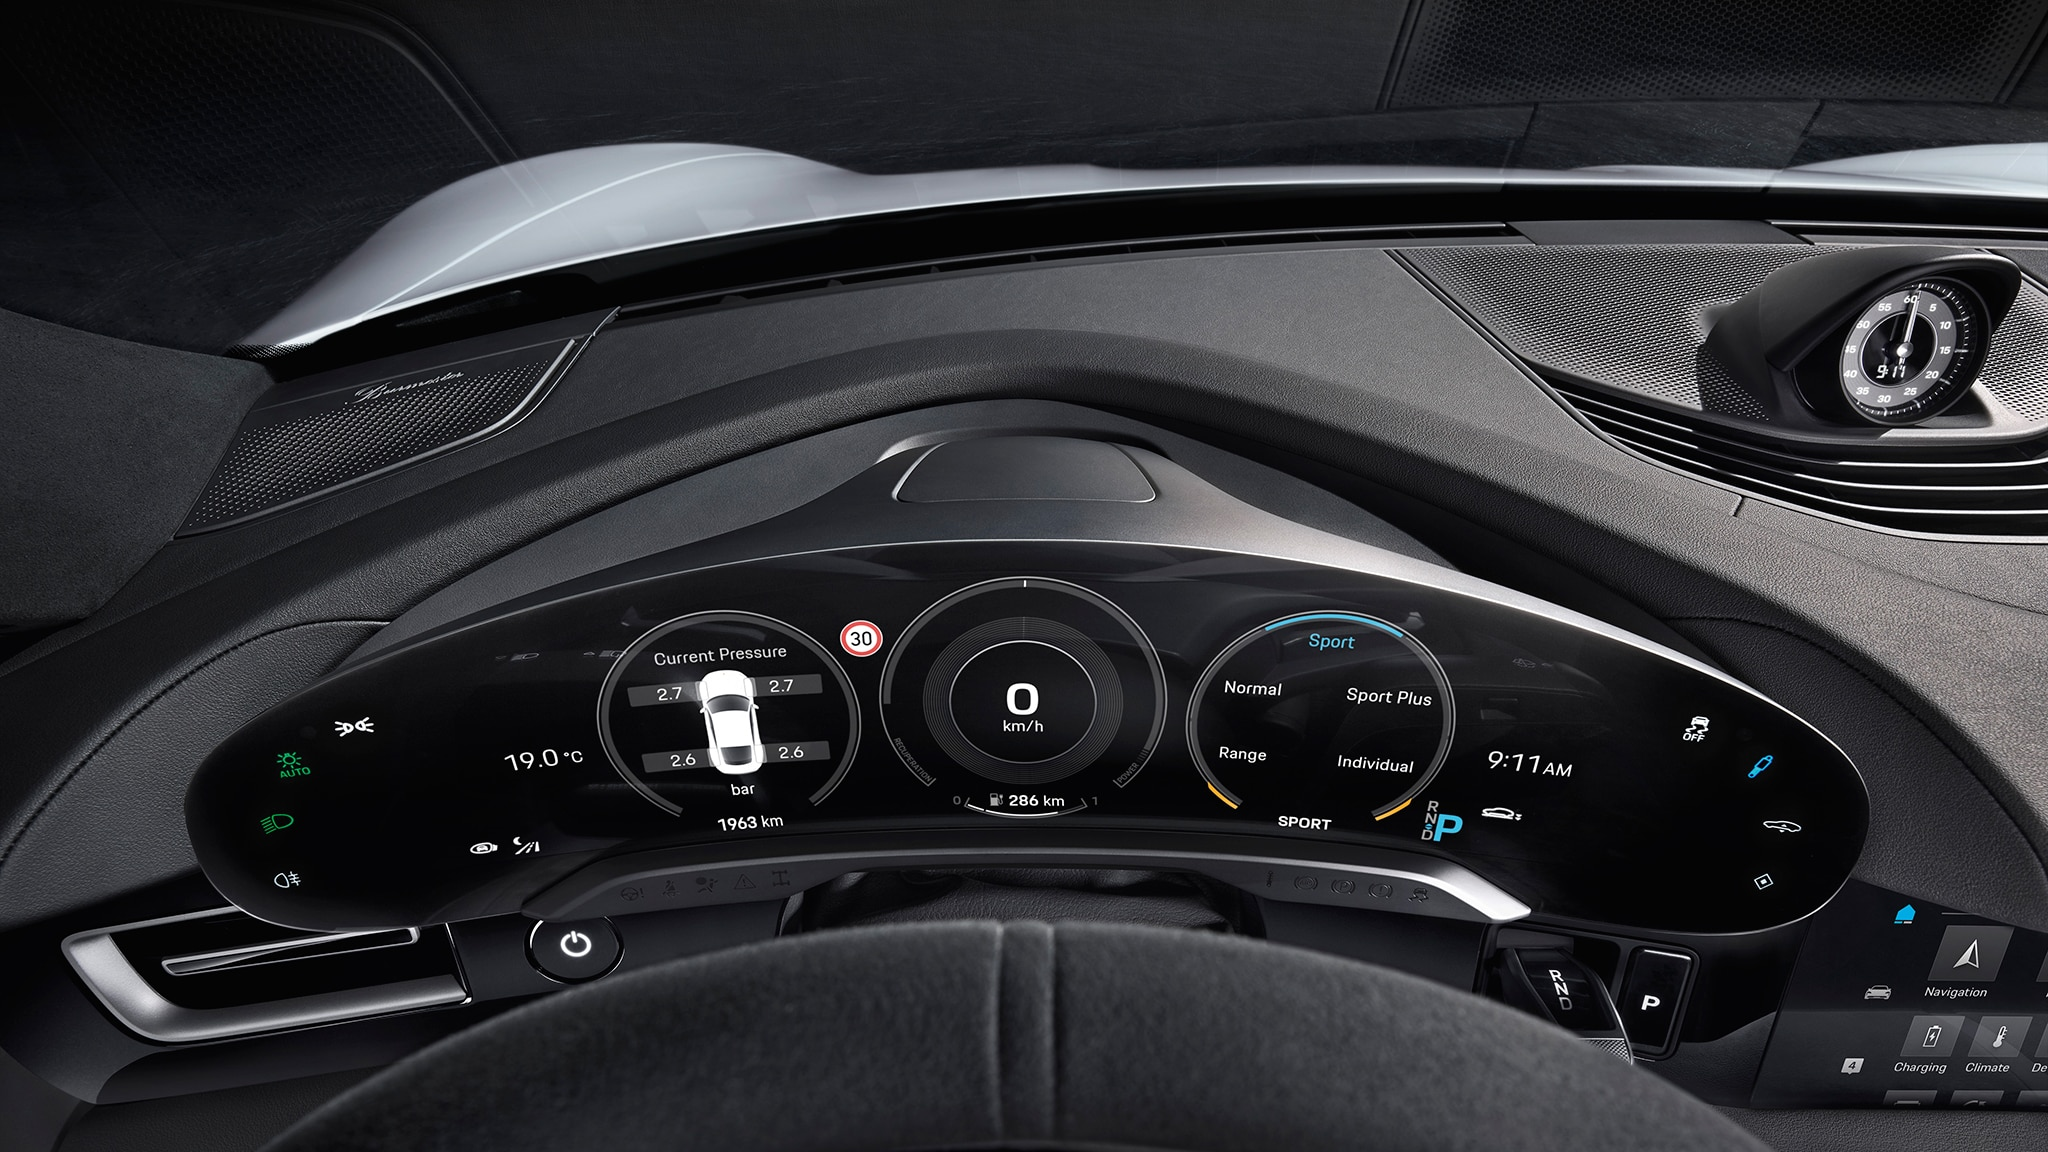 2020 Porsche Taycan: EV Range, Power, and Charging Specs